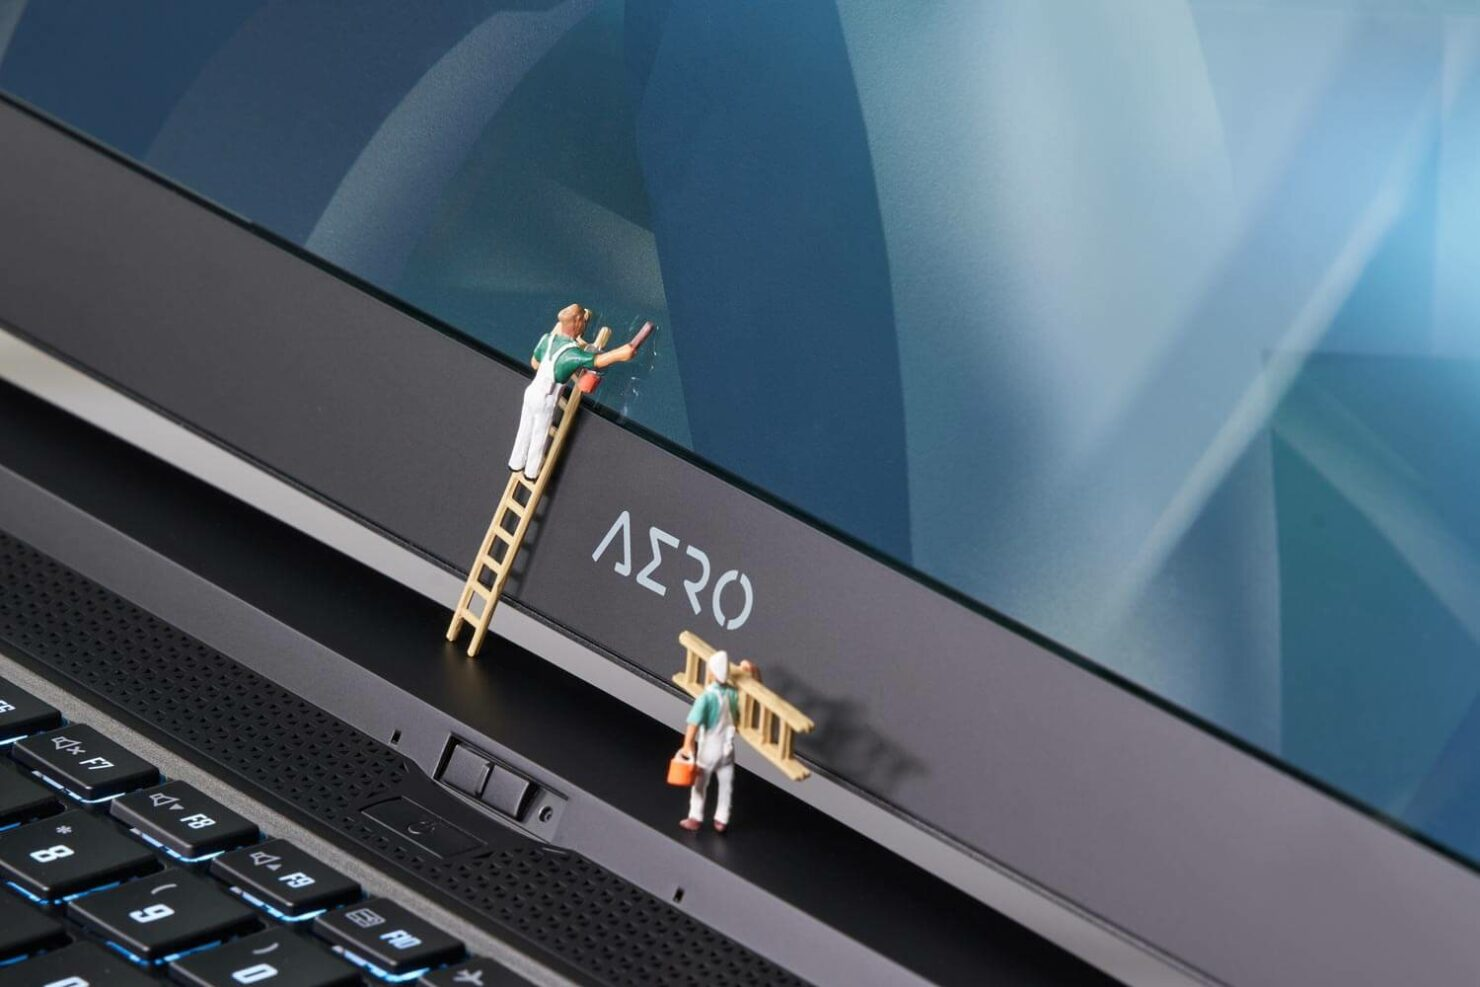 aero-intel-11th-gen-laptop-9